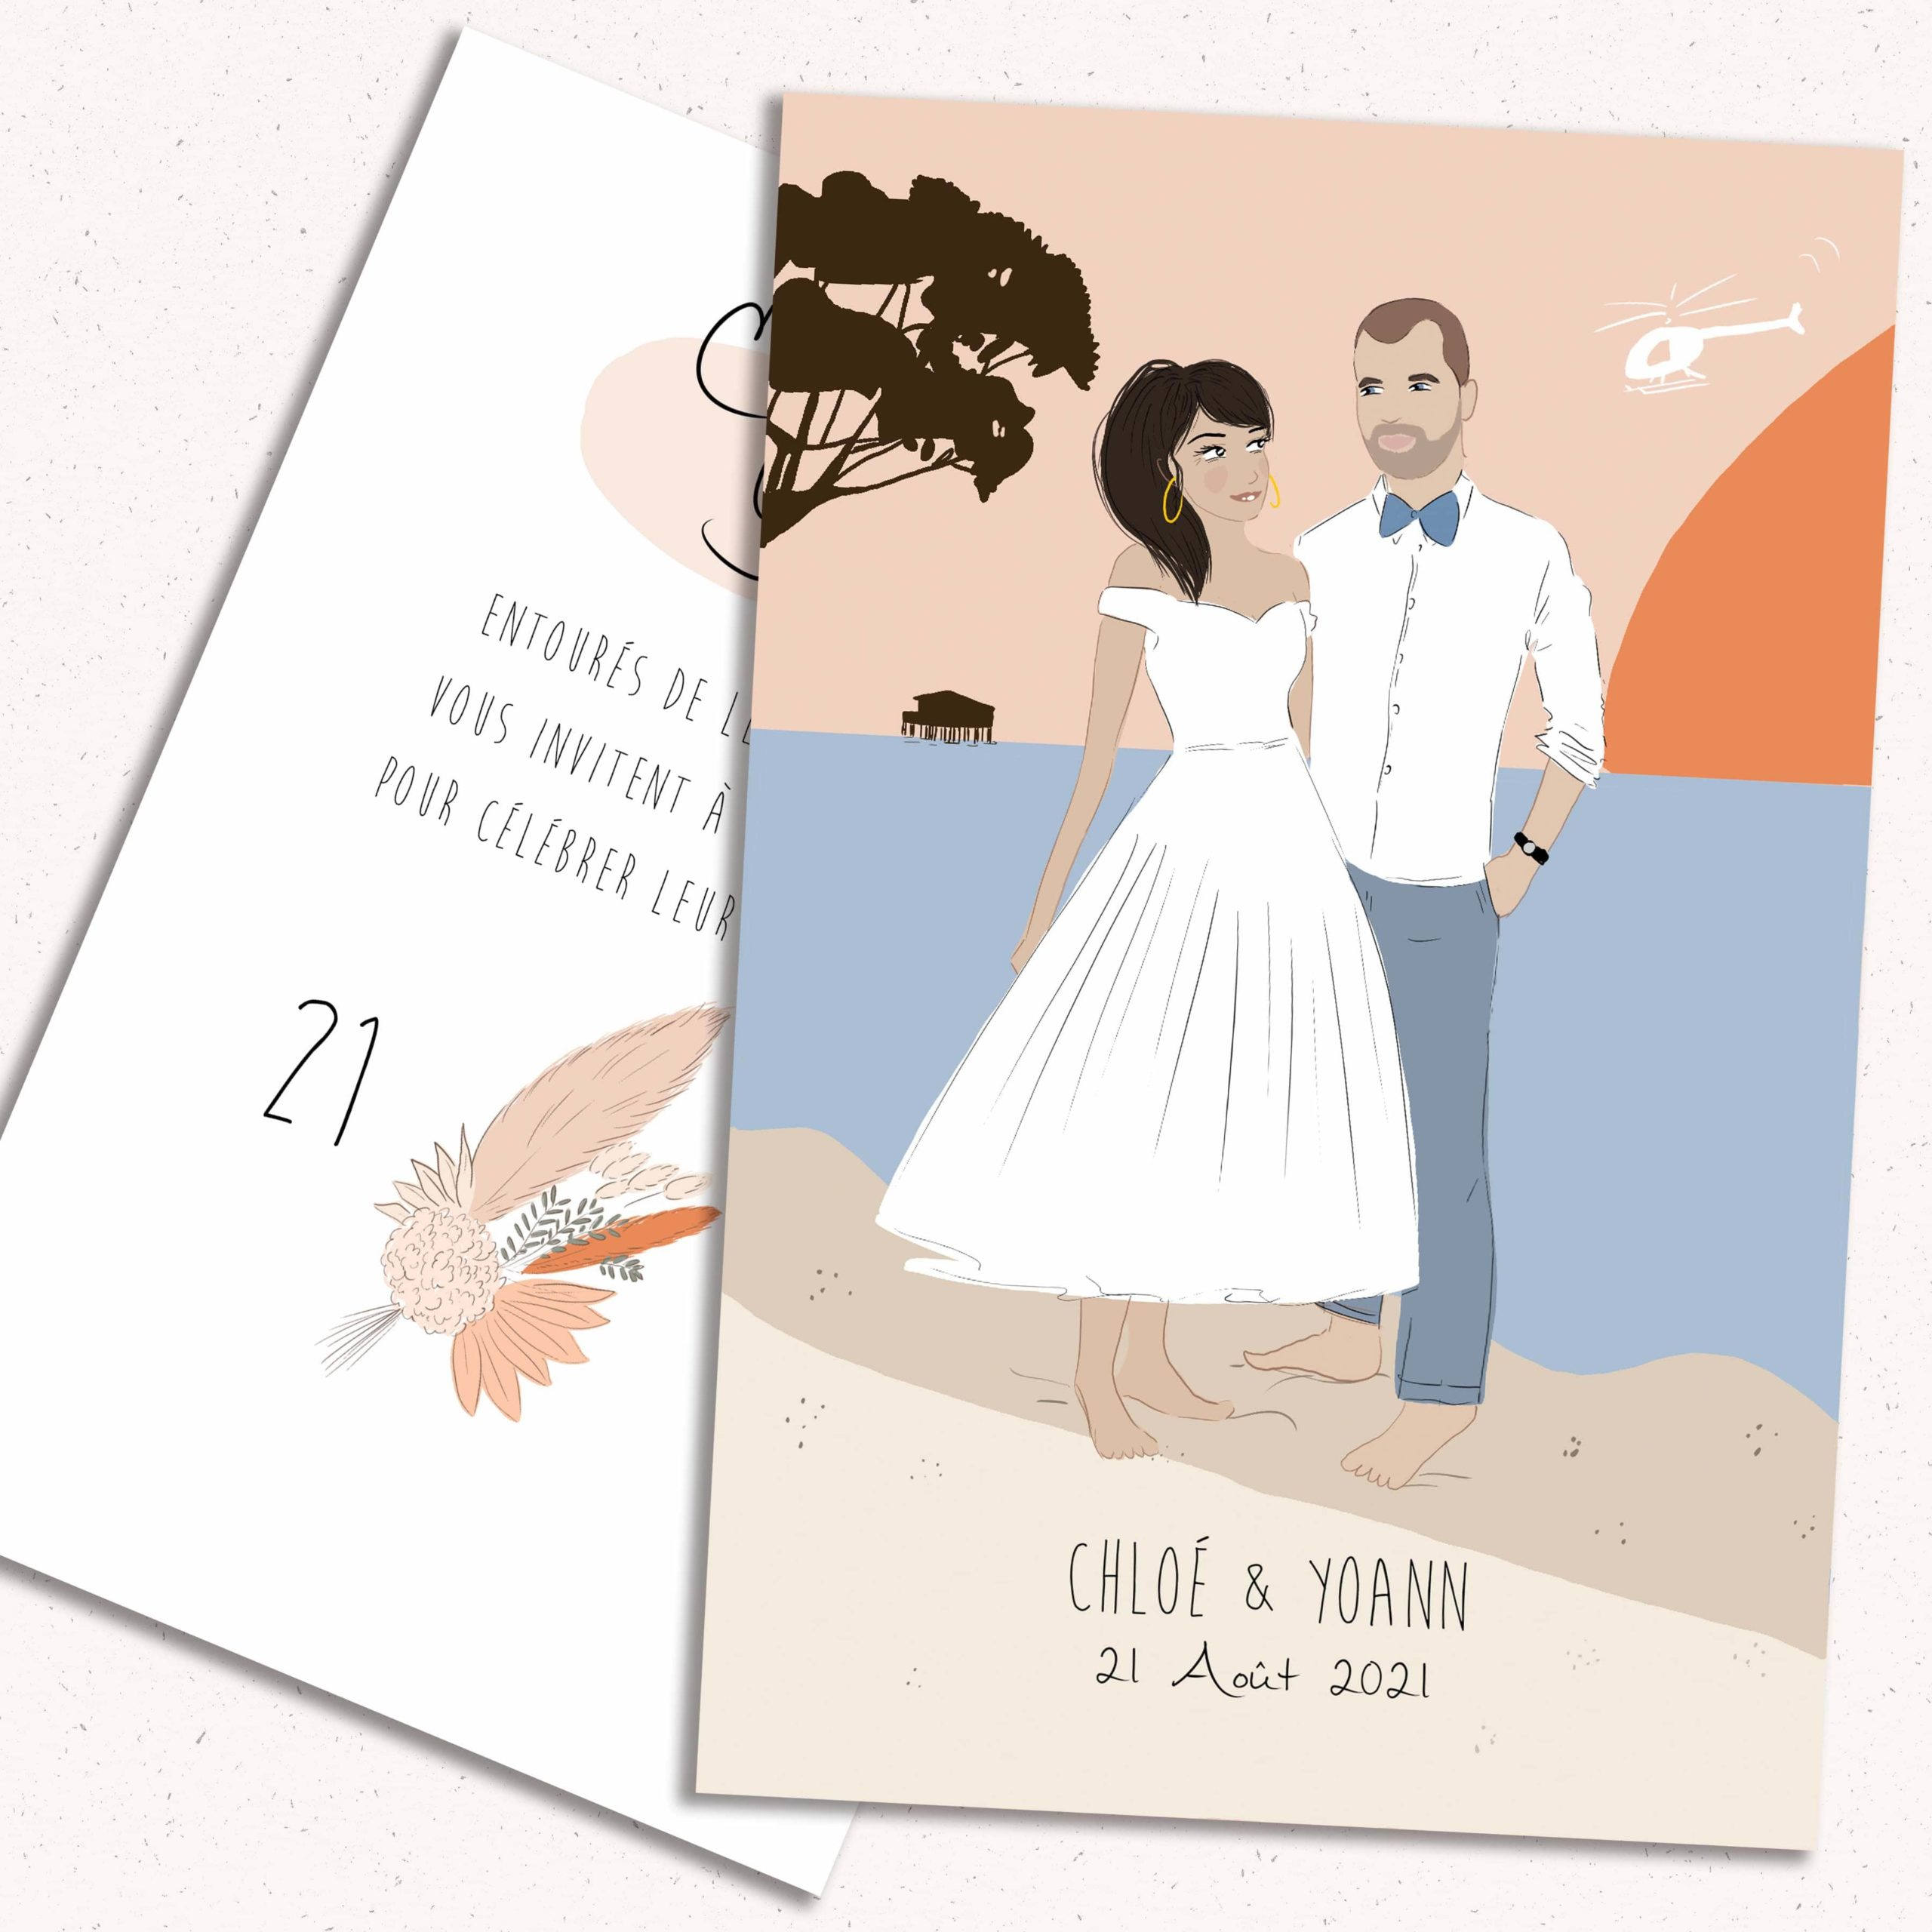 Faire part de mariage - Chloe & Yoann